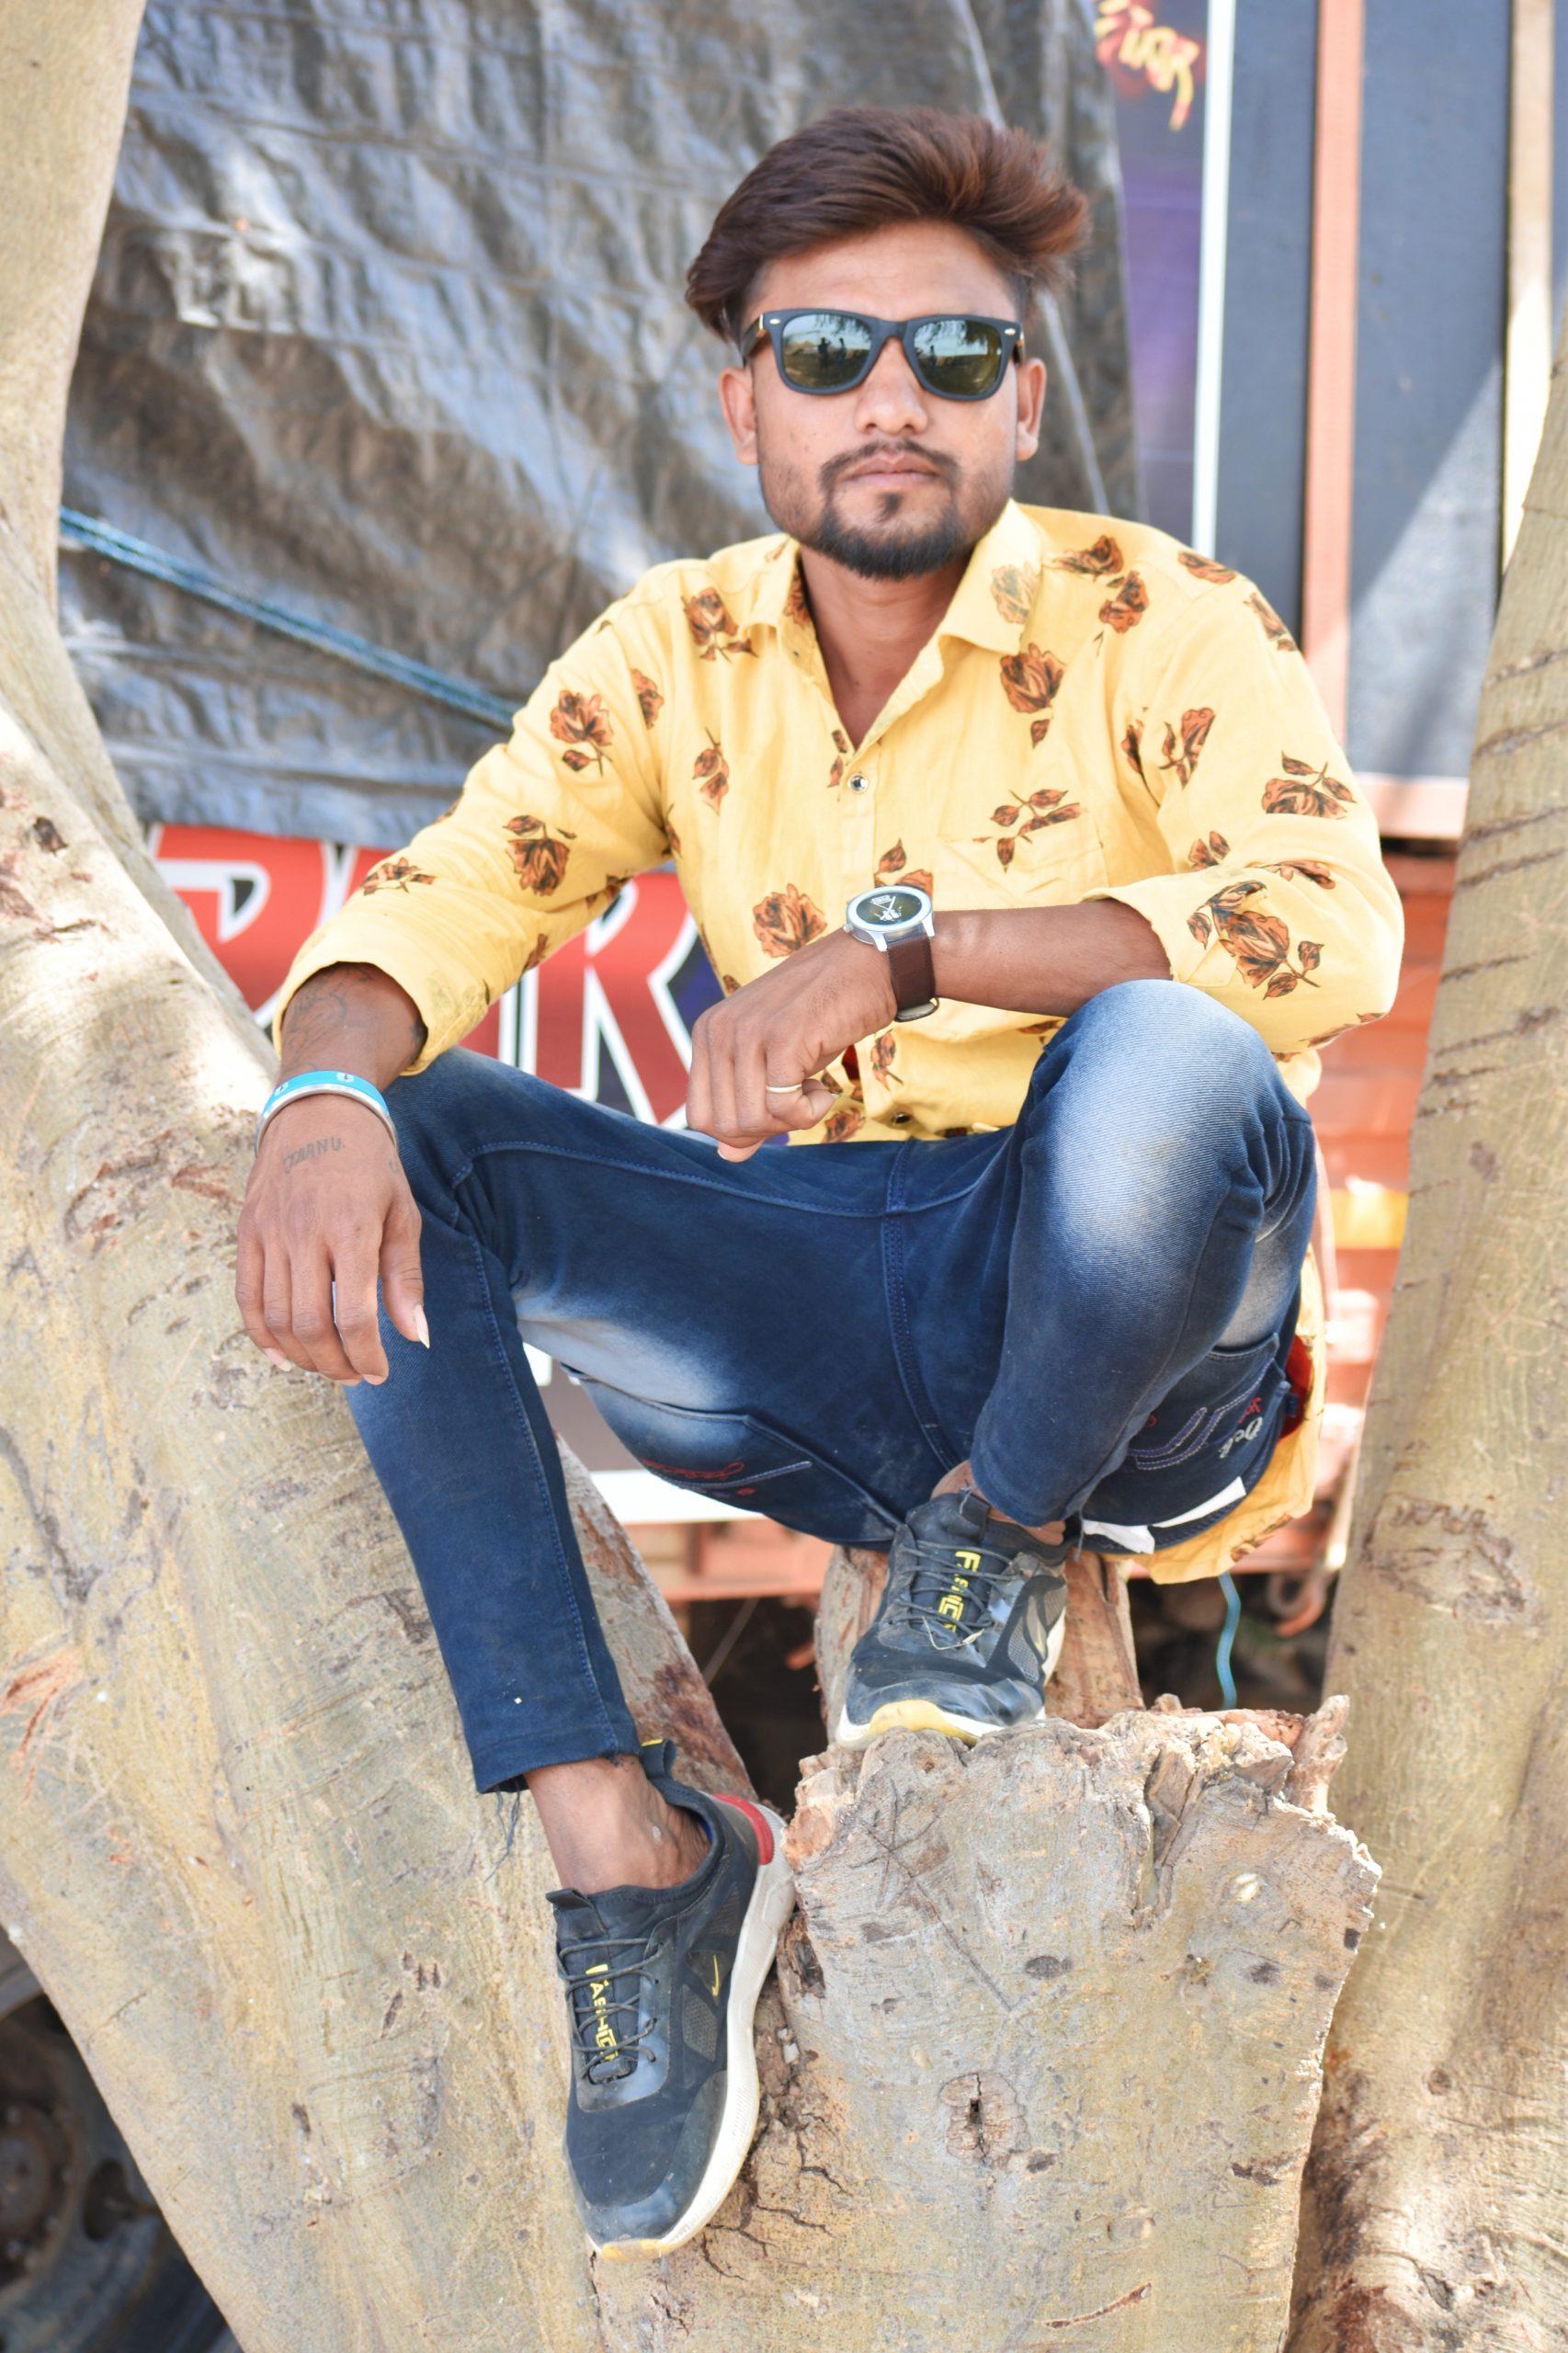 Boy sitting on tree and posing